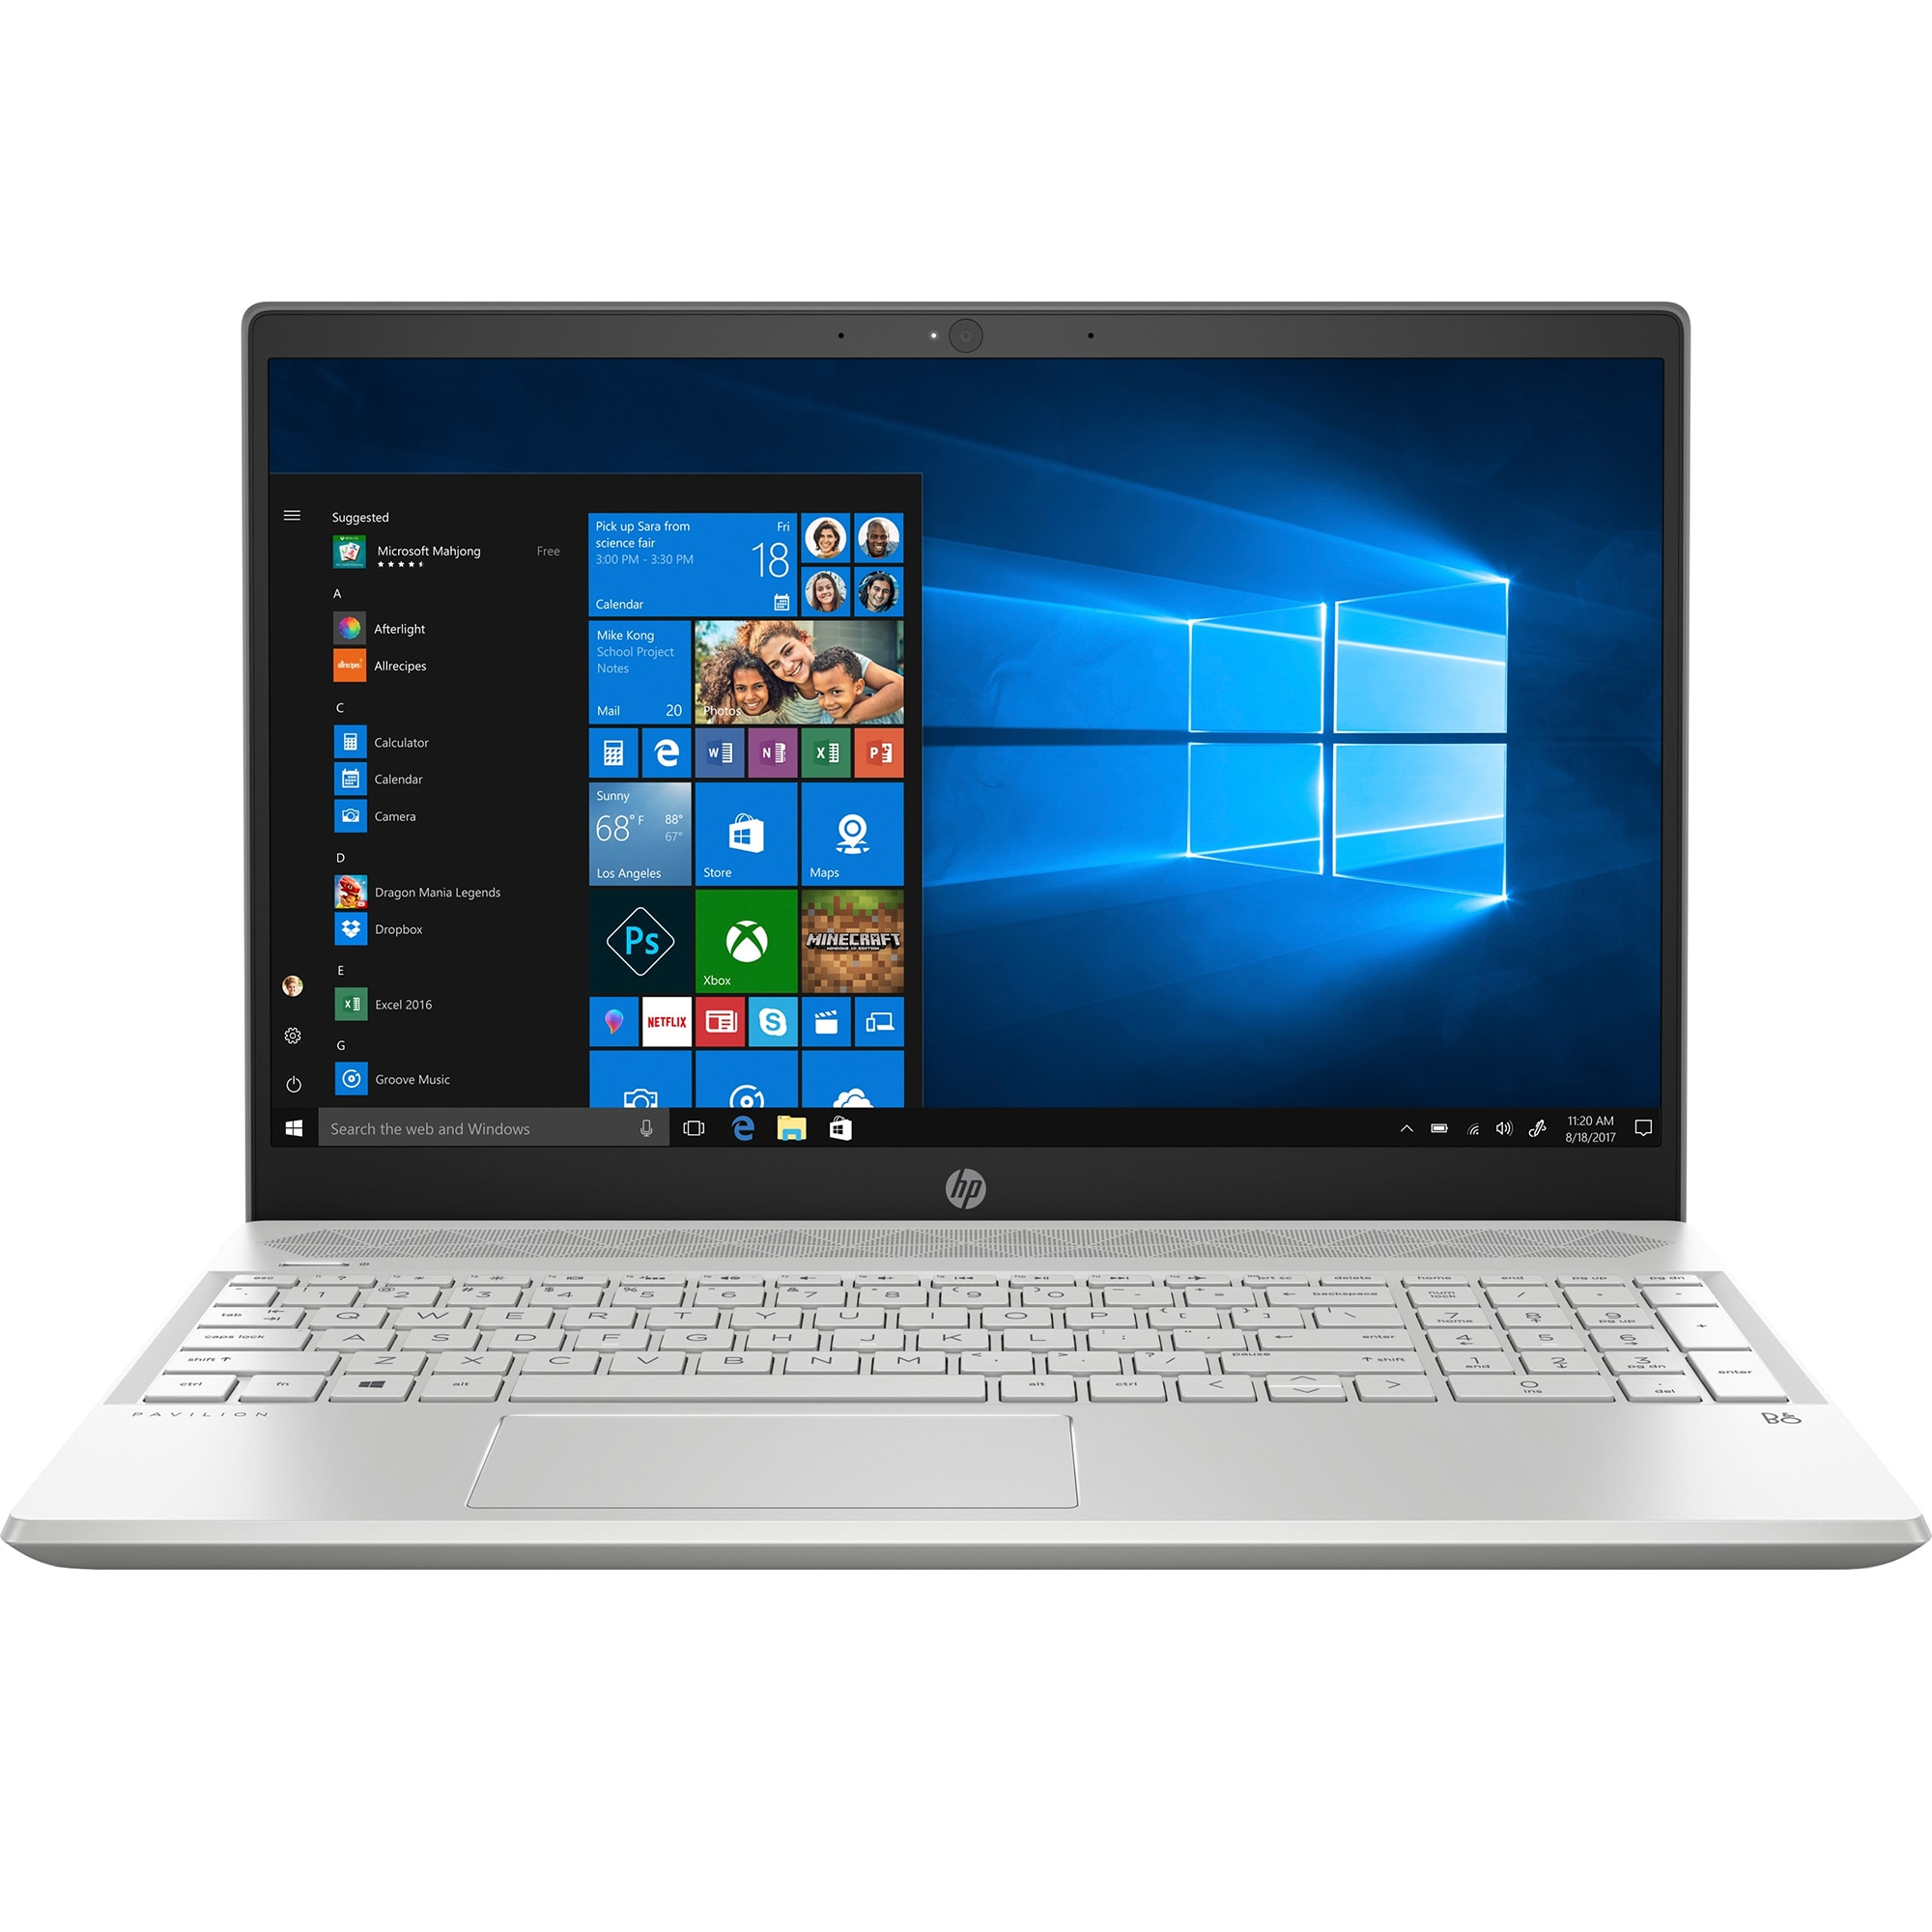 "Fotografie Laptop HP Pavilion 15-cs0003nq cu procesor Intel® Core™ i5-8250U pana la 3.40 GHz, Kaby Lake R, 15.6"", Full HD, 8GB, 256GB SSD, NVIDIA® GeForce® MX130 2GB, Microsoft Windows 10, Silver"